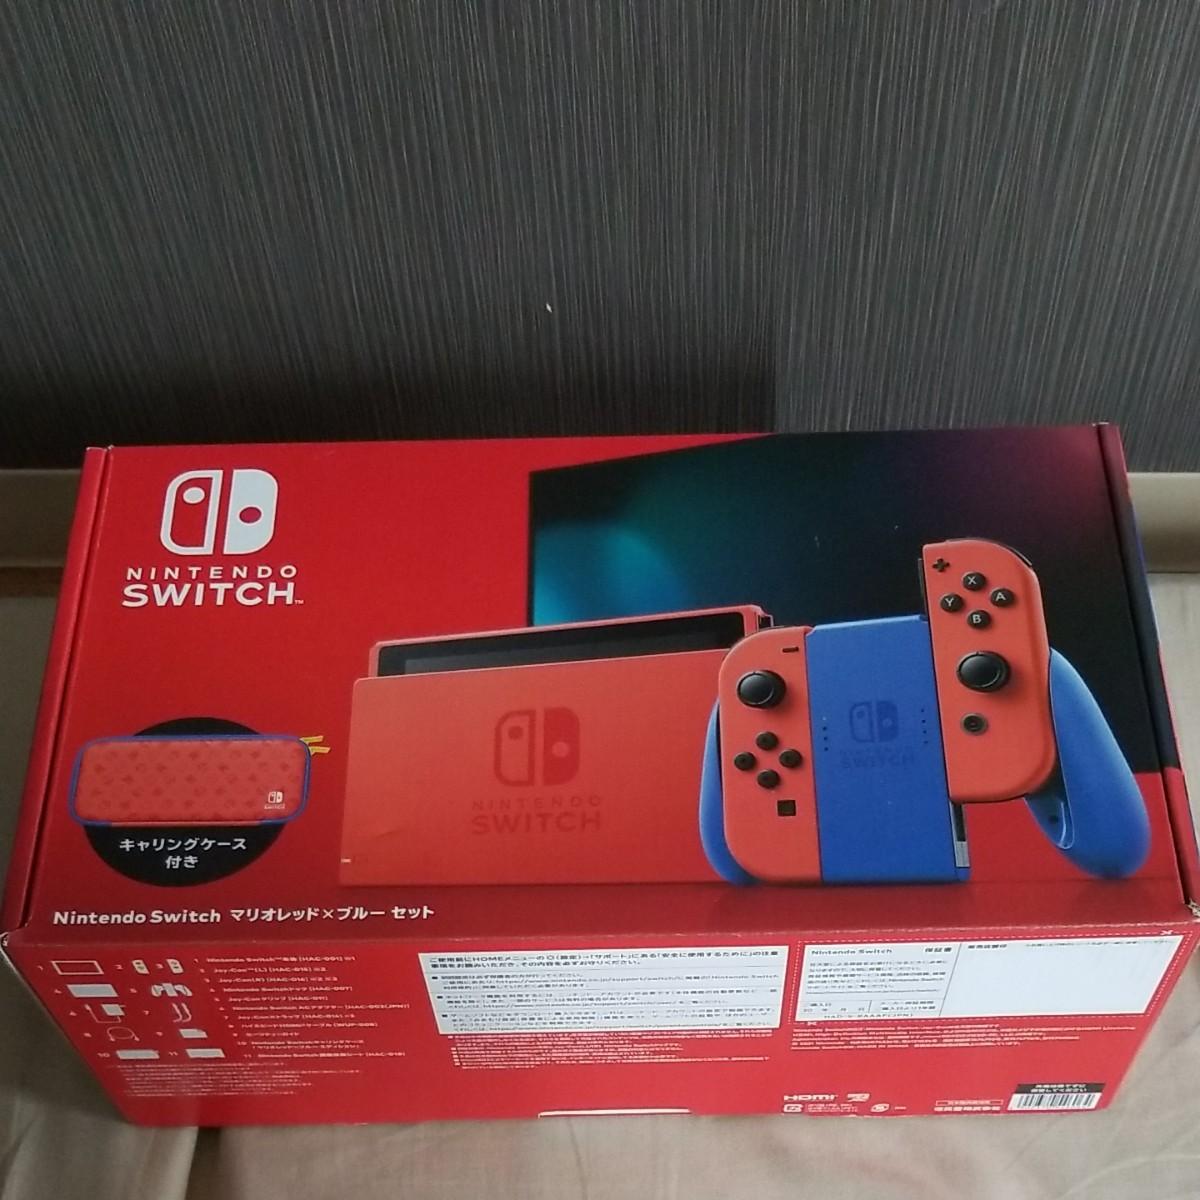 Nintendo Switch 本体 【マリオレッド×ブルー セット】